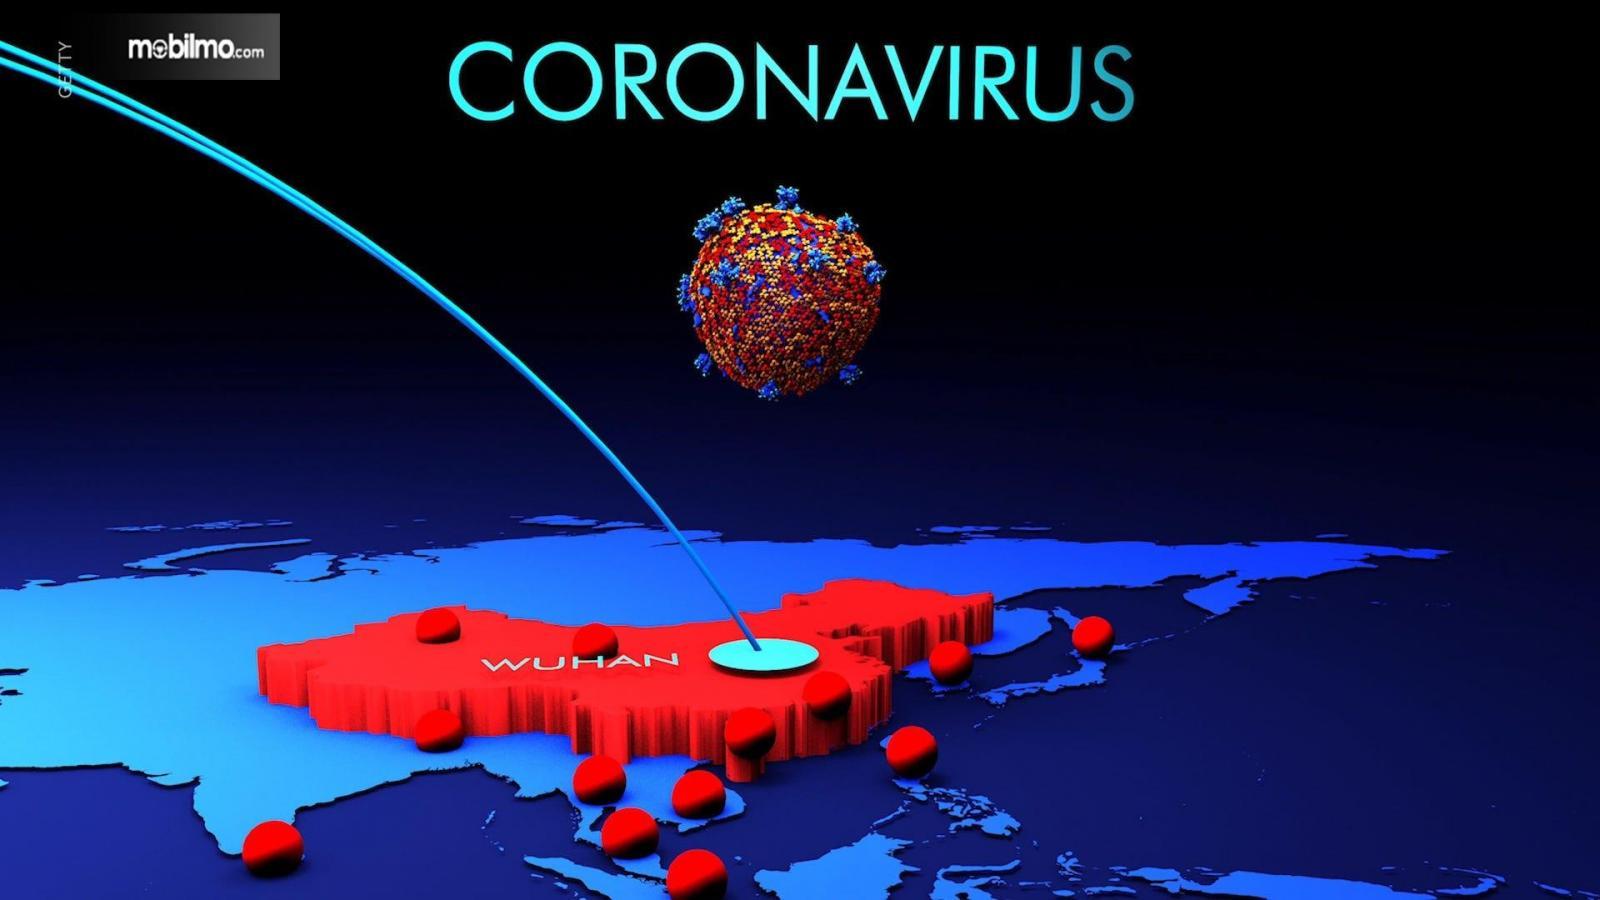 Gambar ilustrasi penyebaran Virus Corona